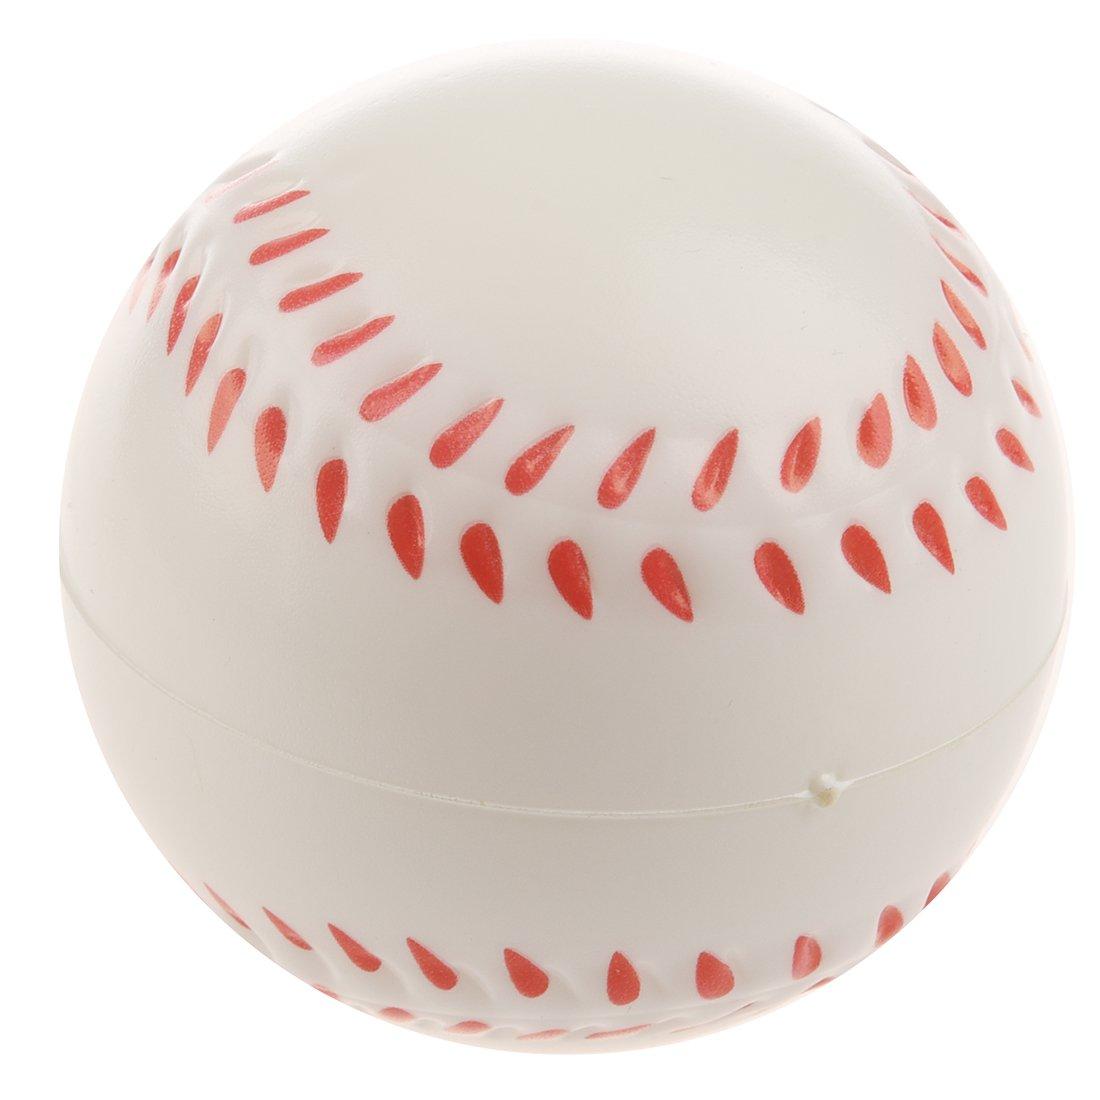 WOVELOT White Baseball Stress Ball